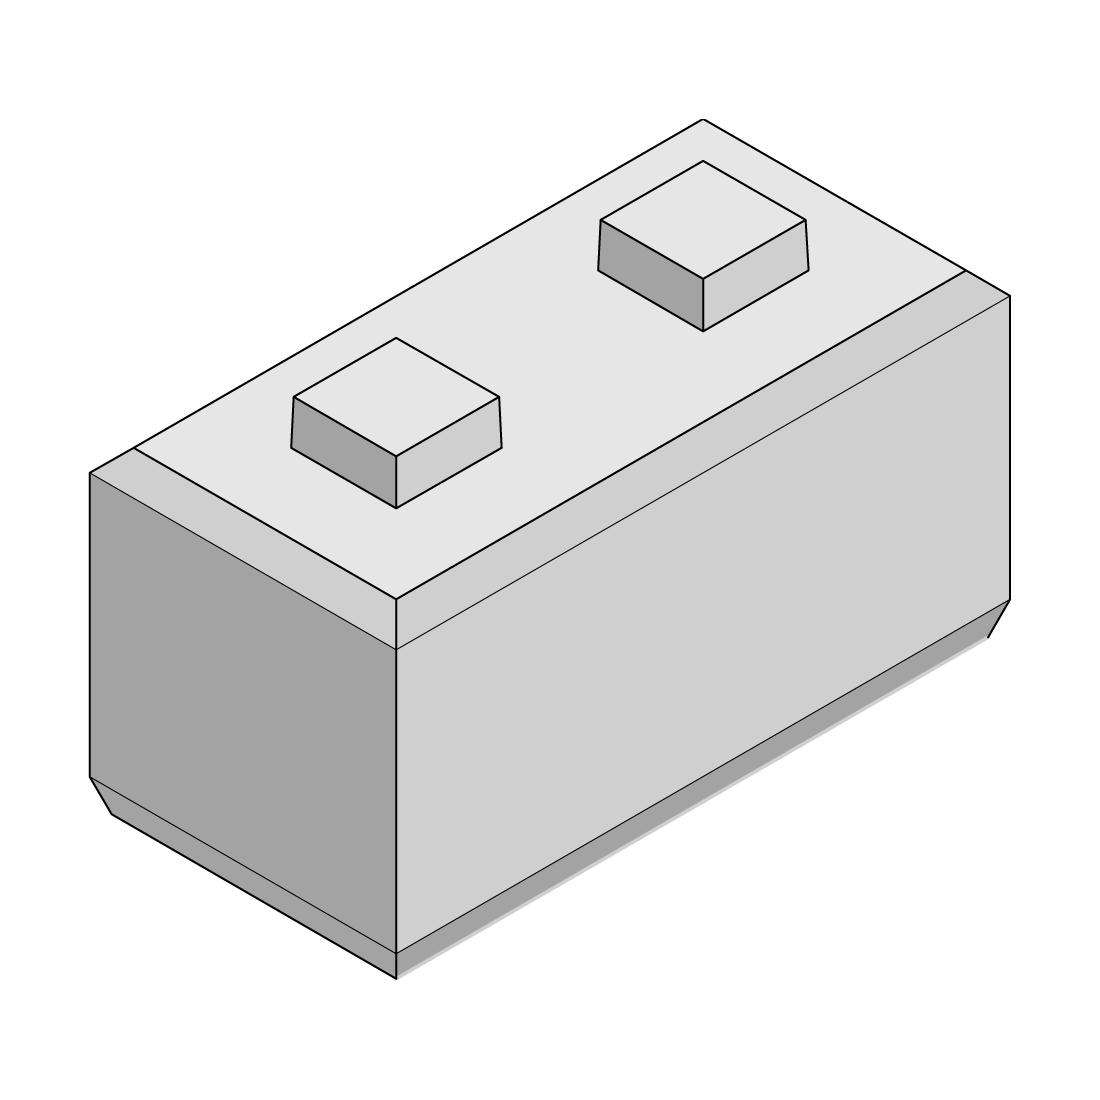 Kilkenny Precast Concrete - Lego Block